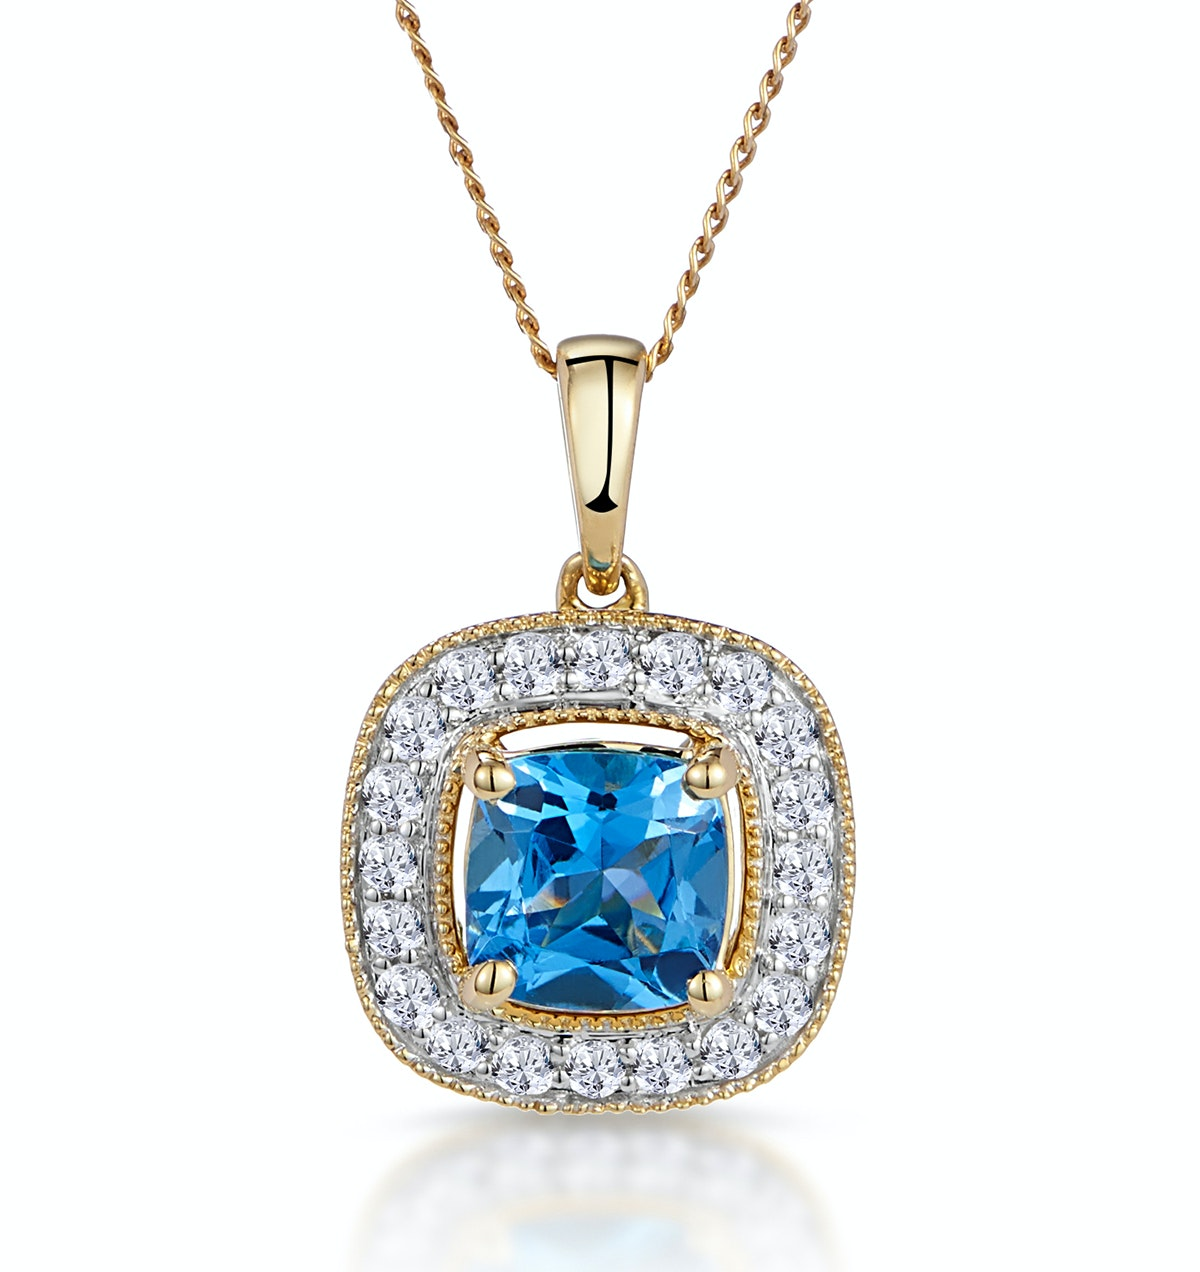 2.50ct Blue Topaz Asteria Collection Diamond Halo Pendant in 18K Gold